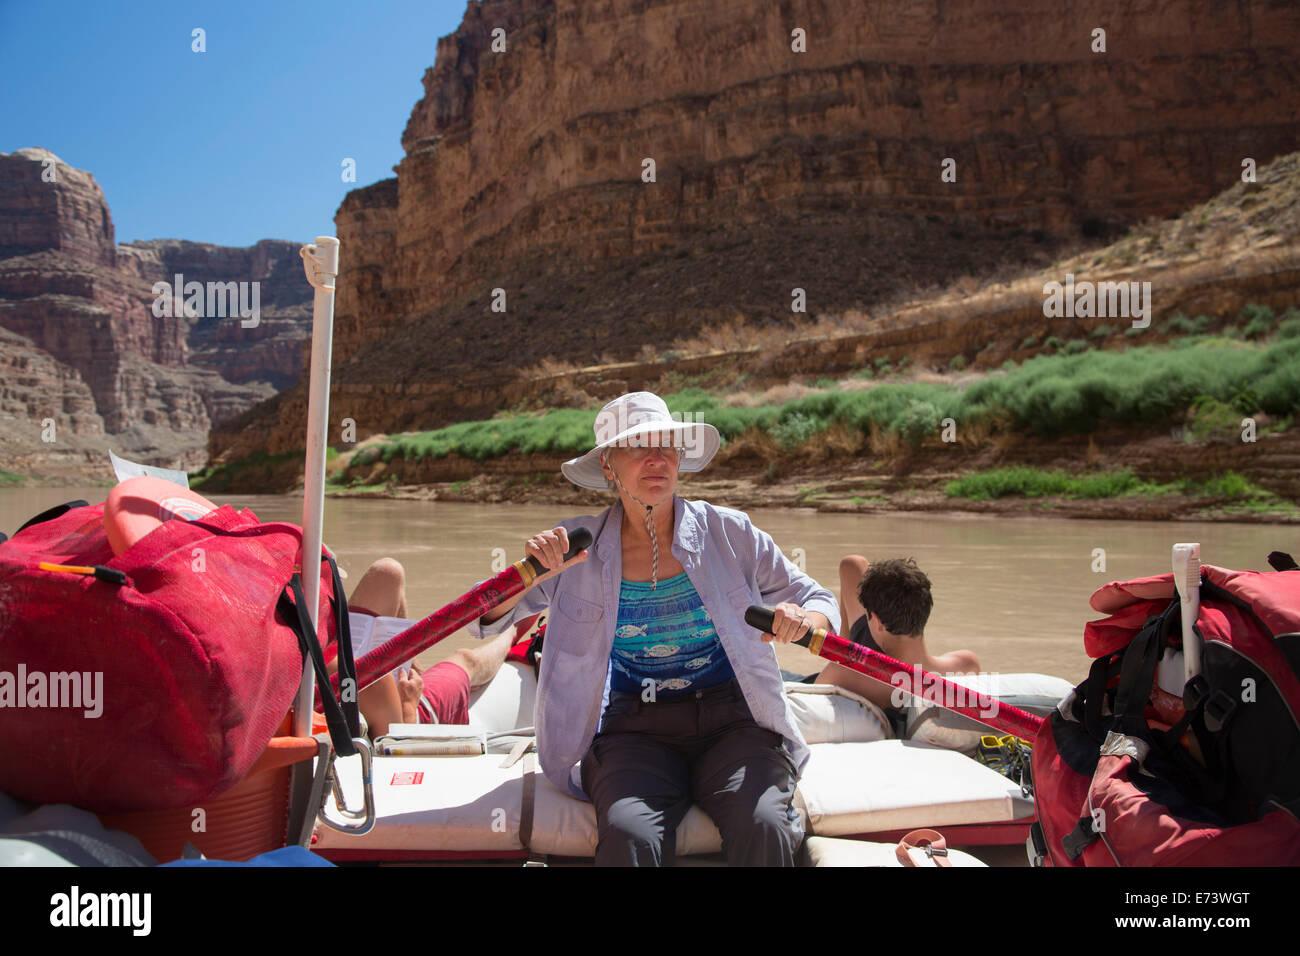 Canyonlands National Park, Utah - Susan Newell, 65, rows a raft on the Colorado River through Cataract Canyon. - Stock Image